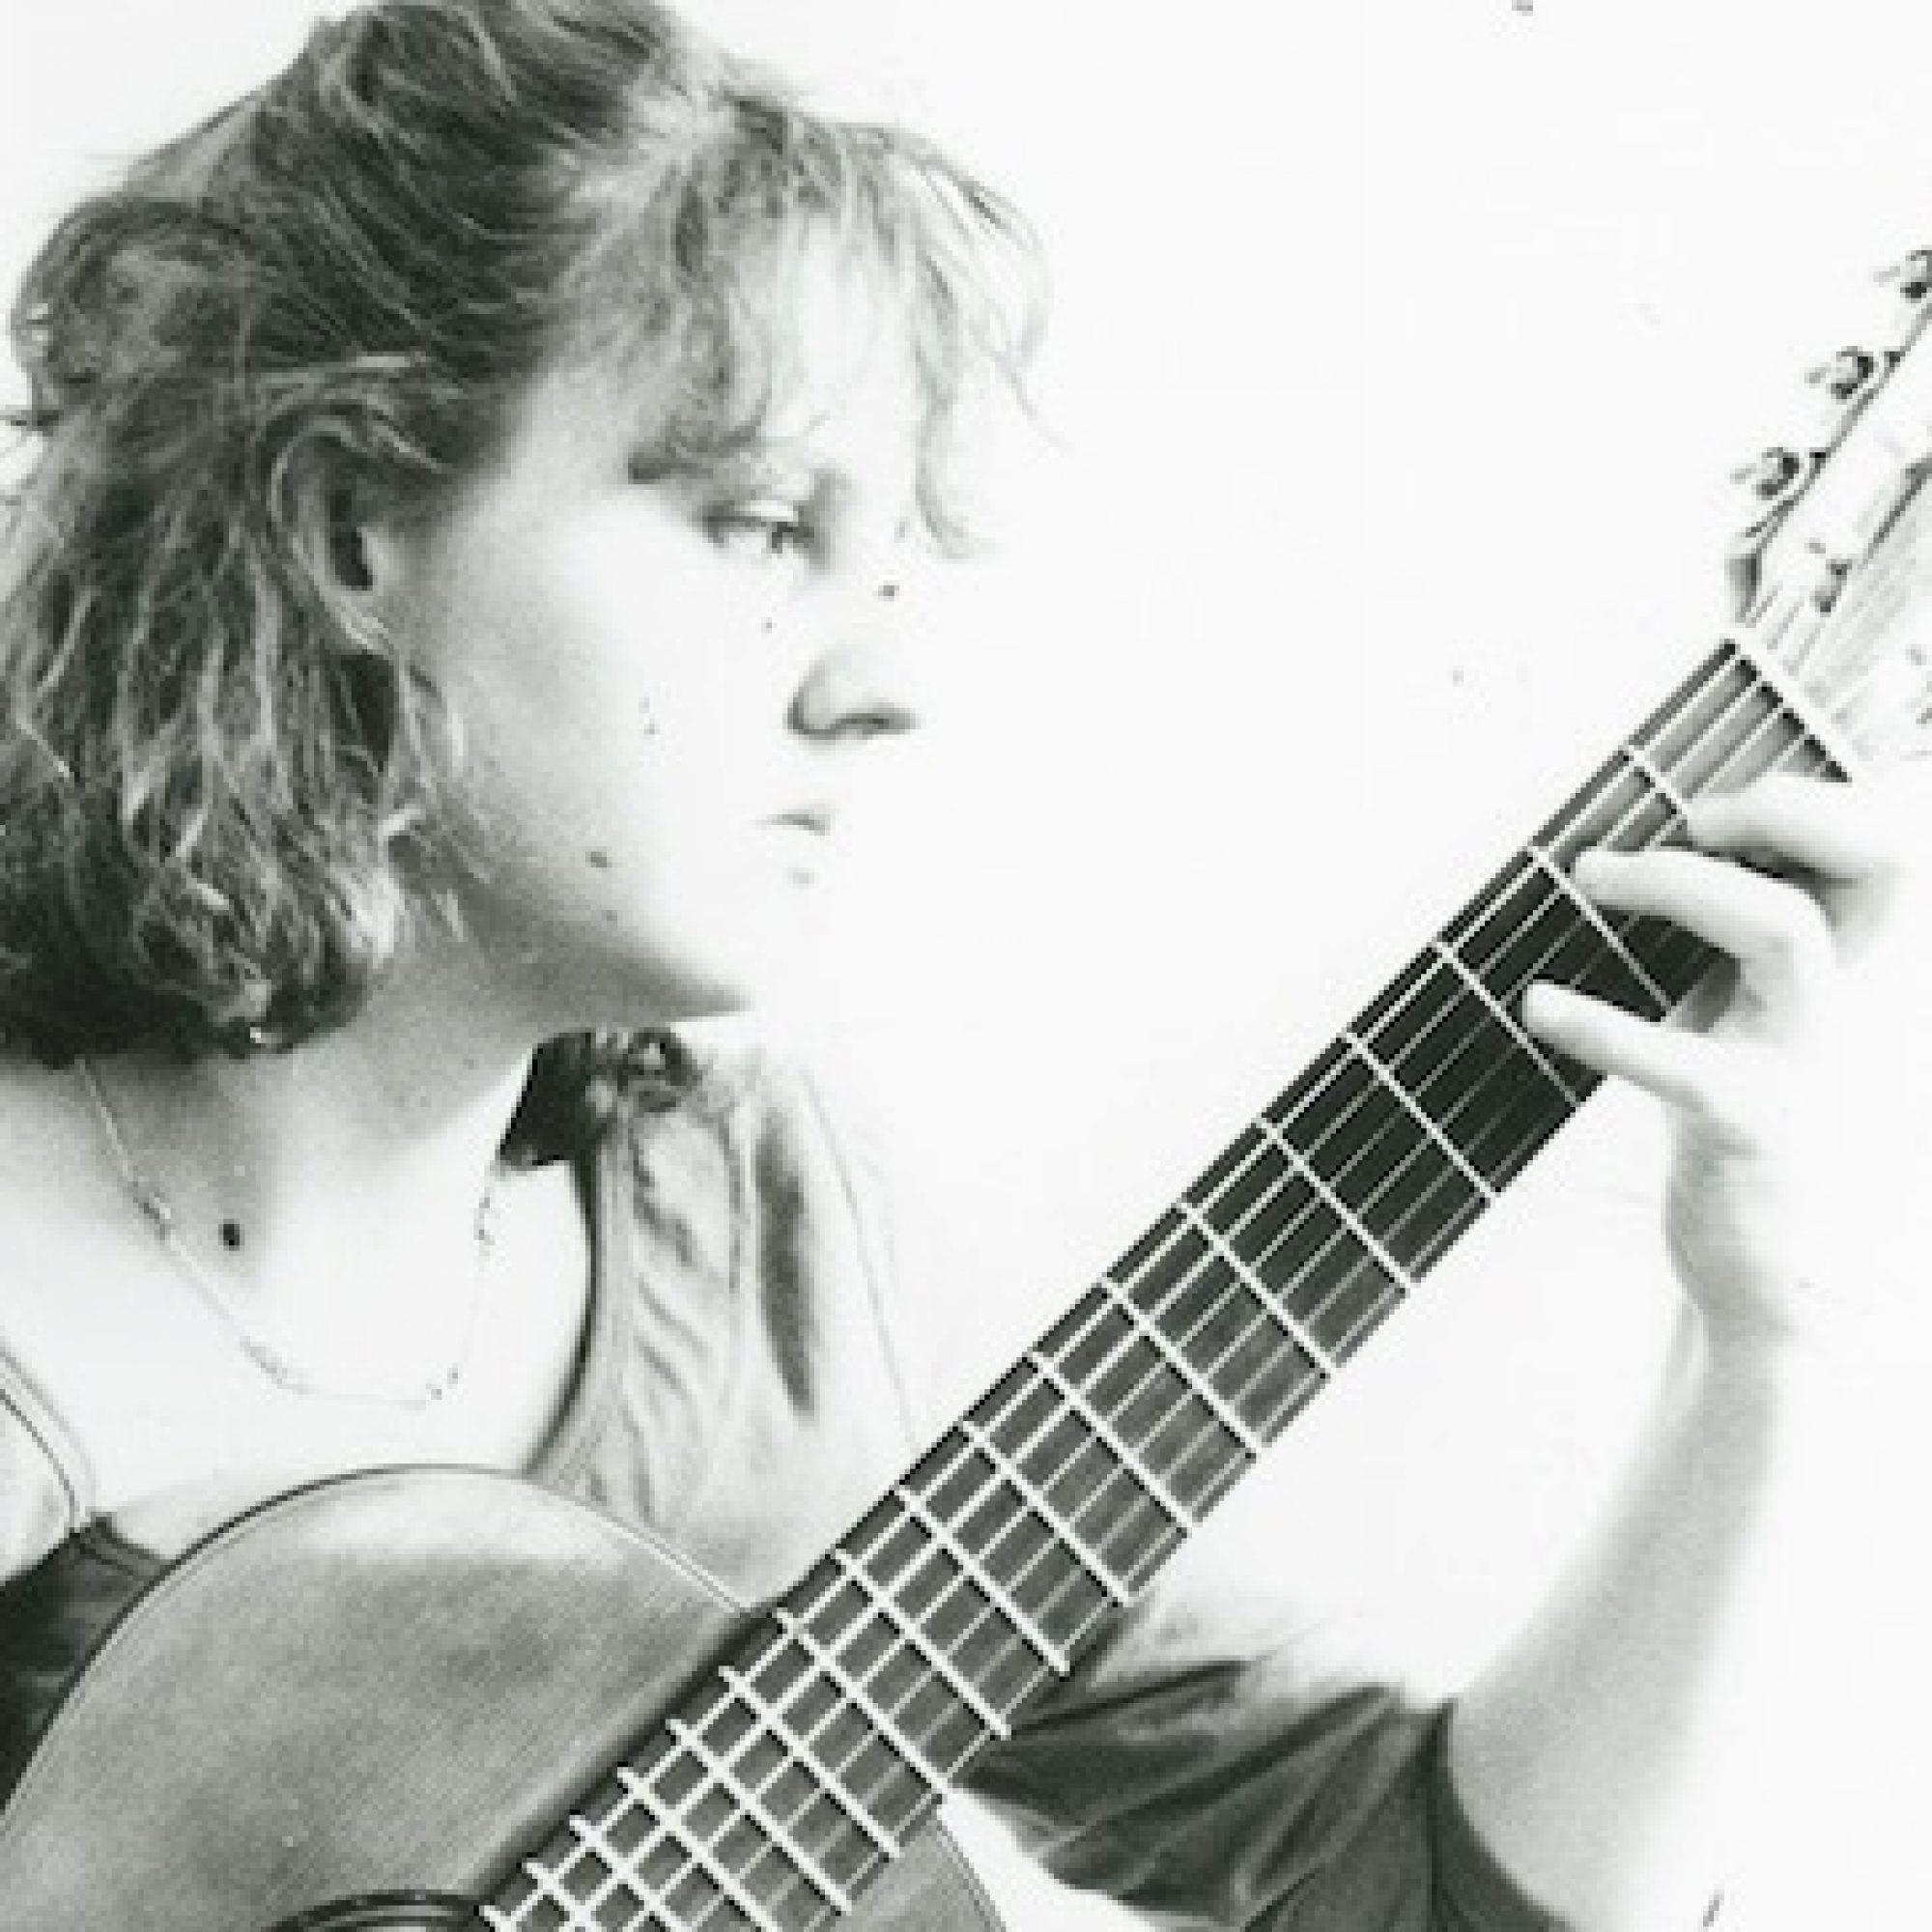 Nadia Sartori